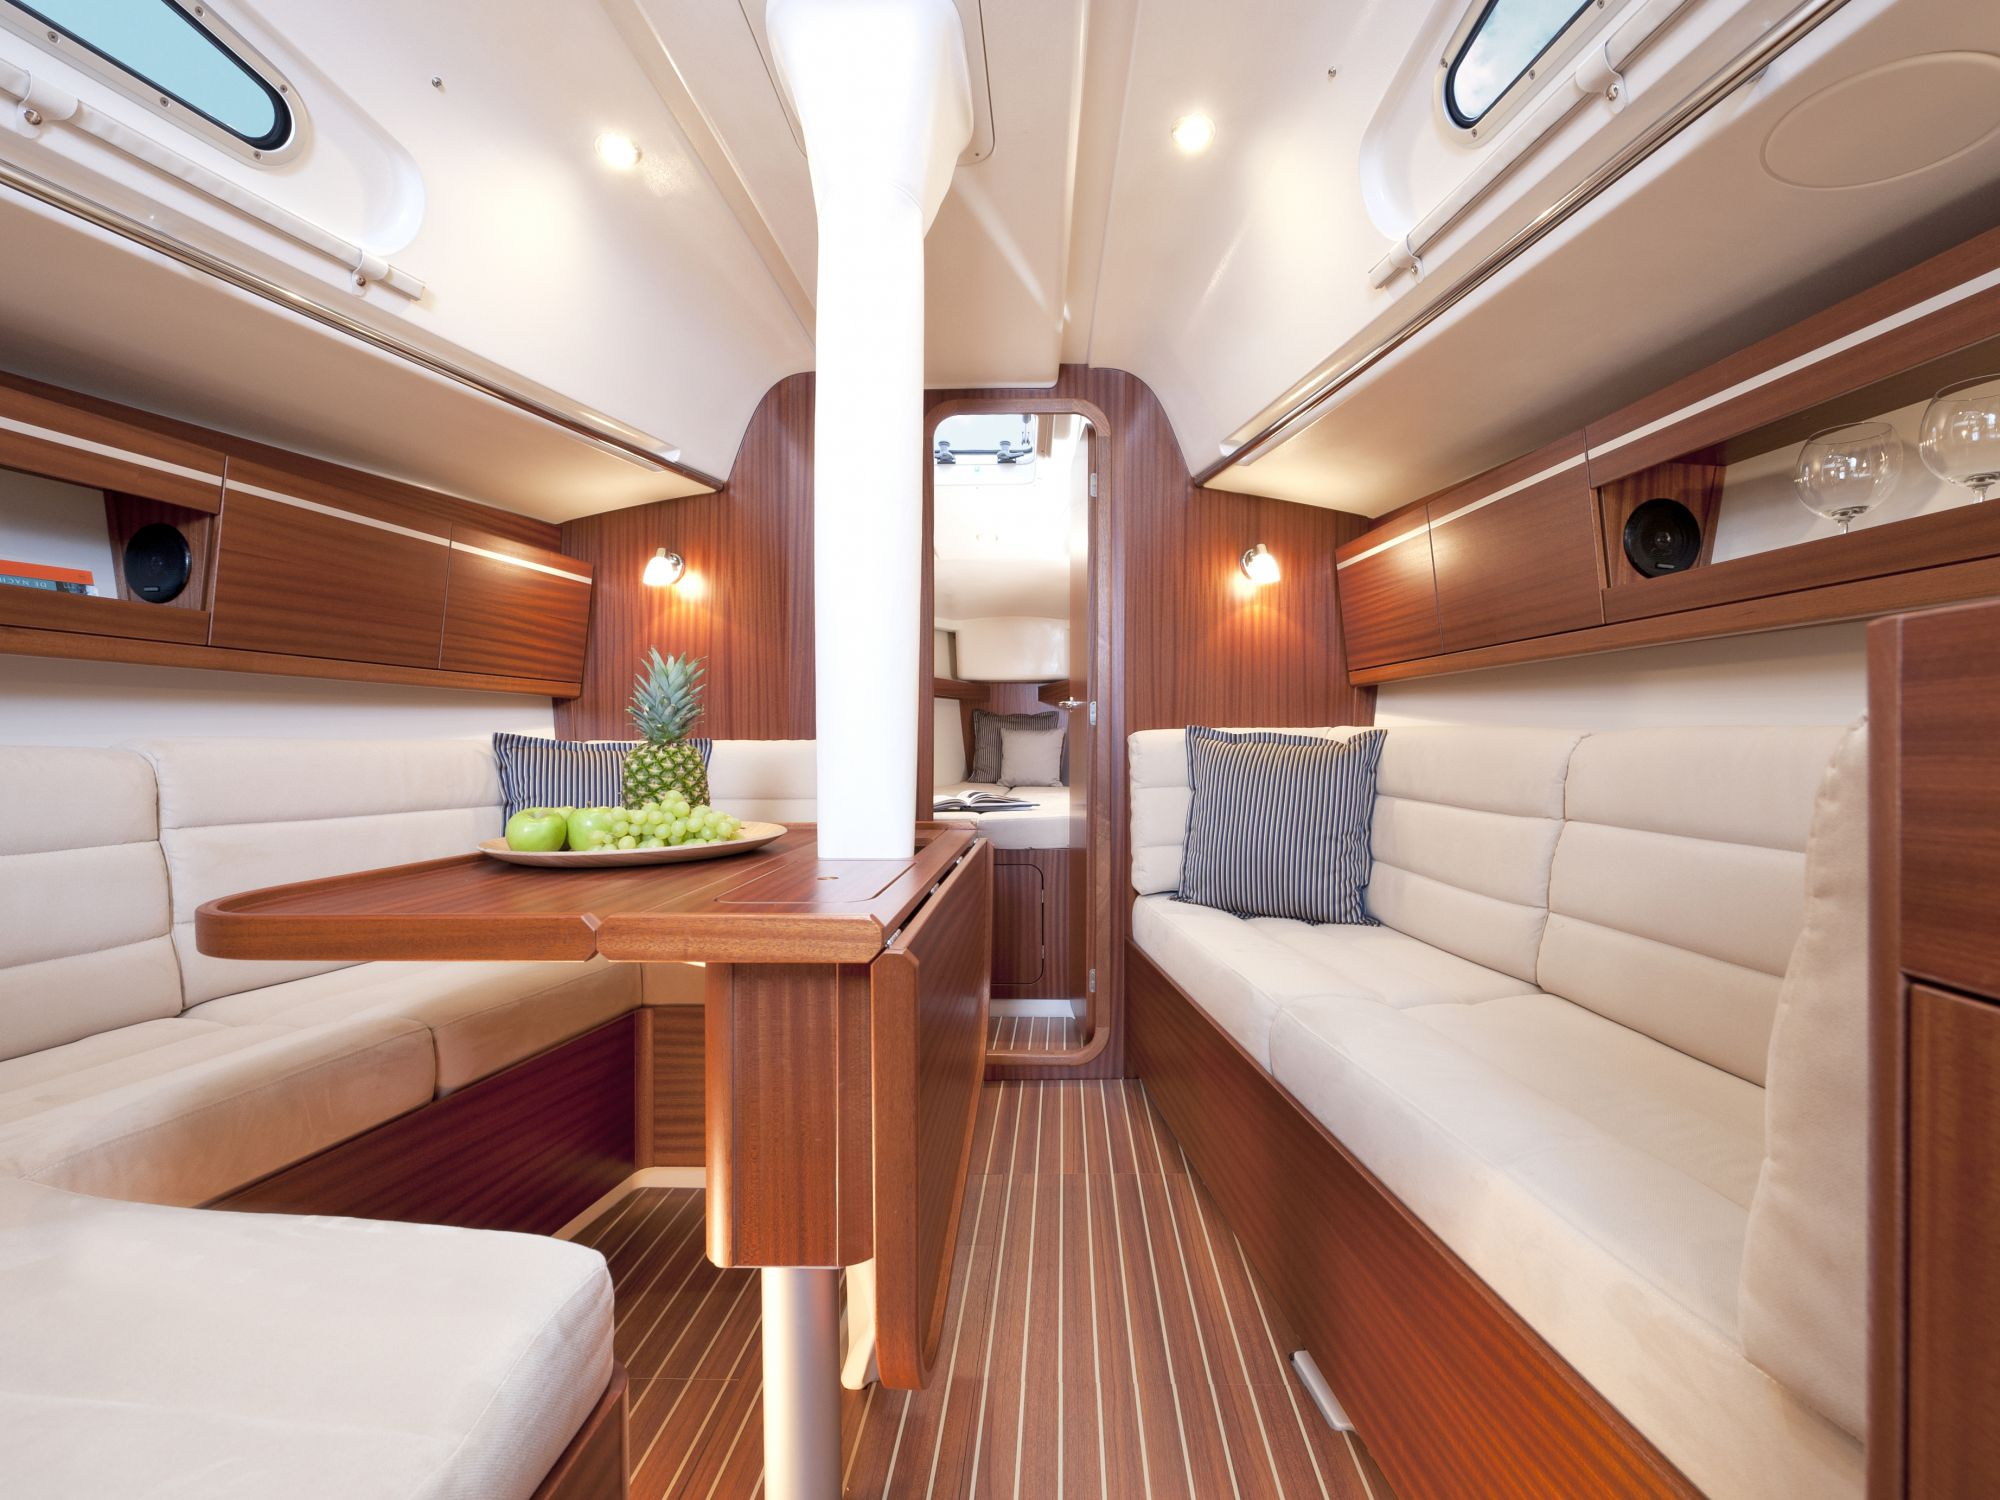 Boot Segelyachten 30 ft - 35 ft Interieur